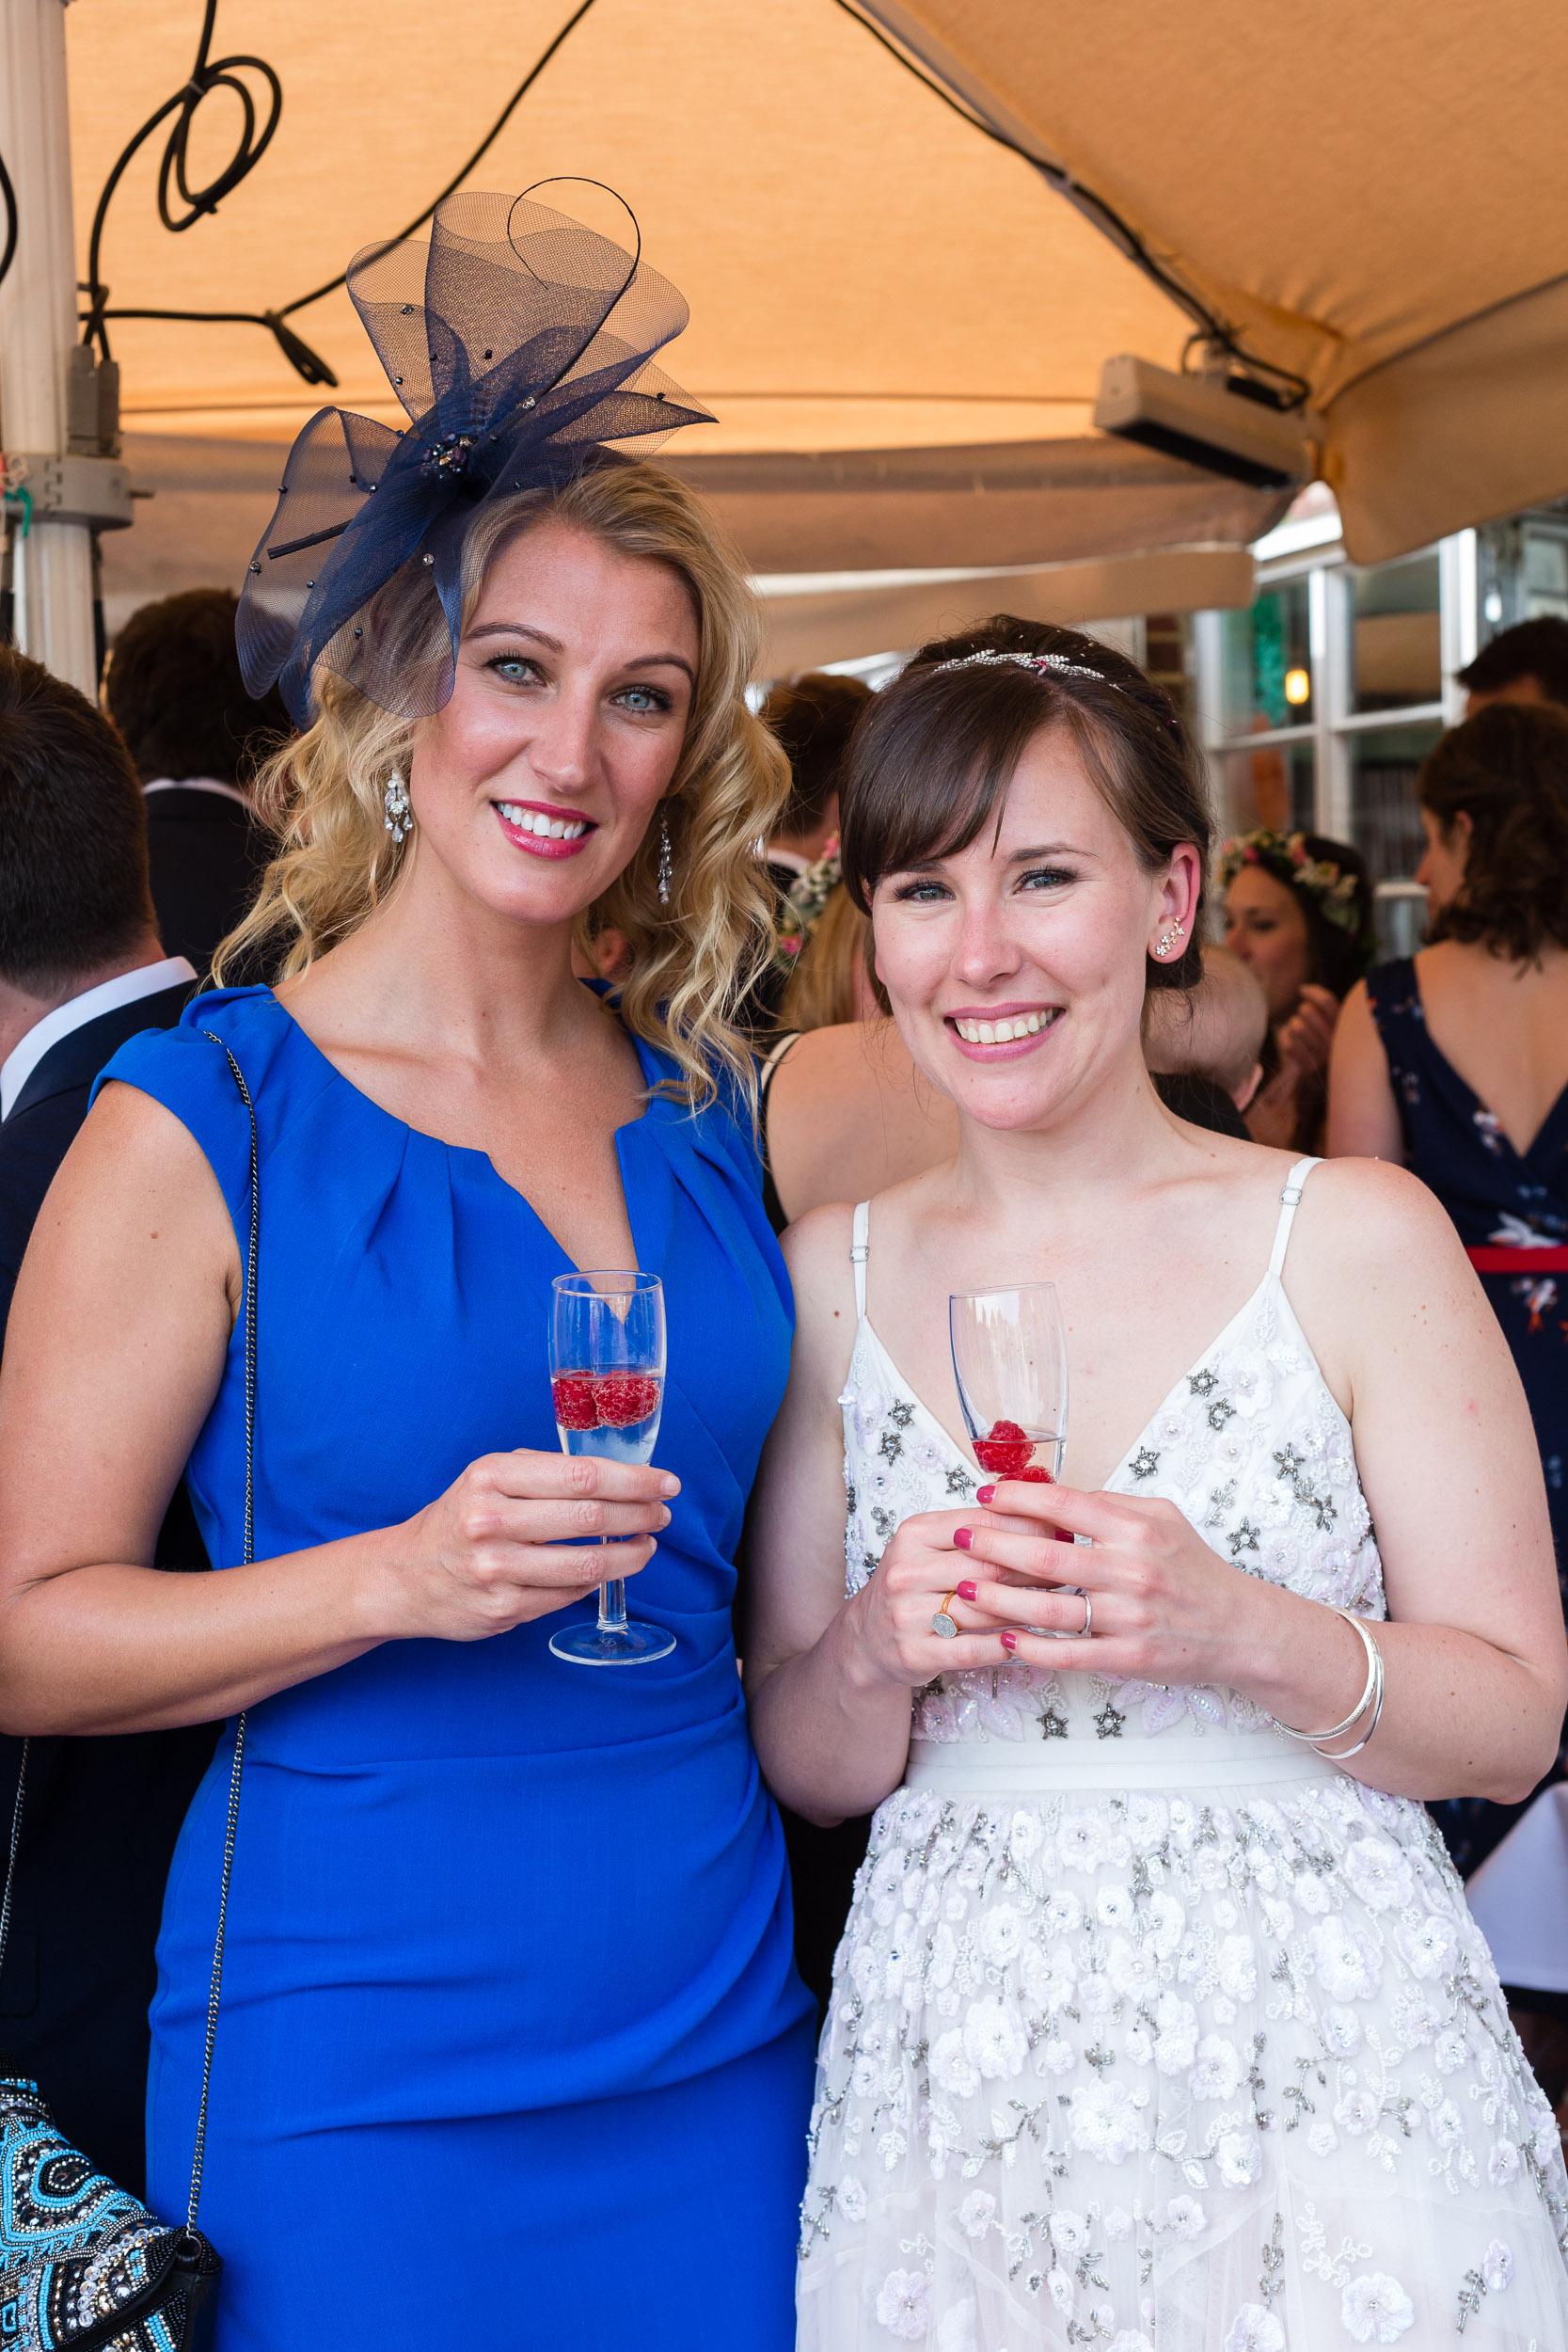 brockwell-lido-brixton-herne-hill-wedding-238.jpg